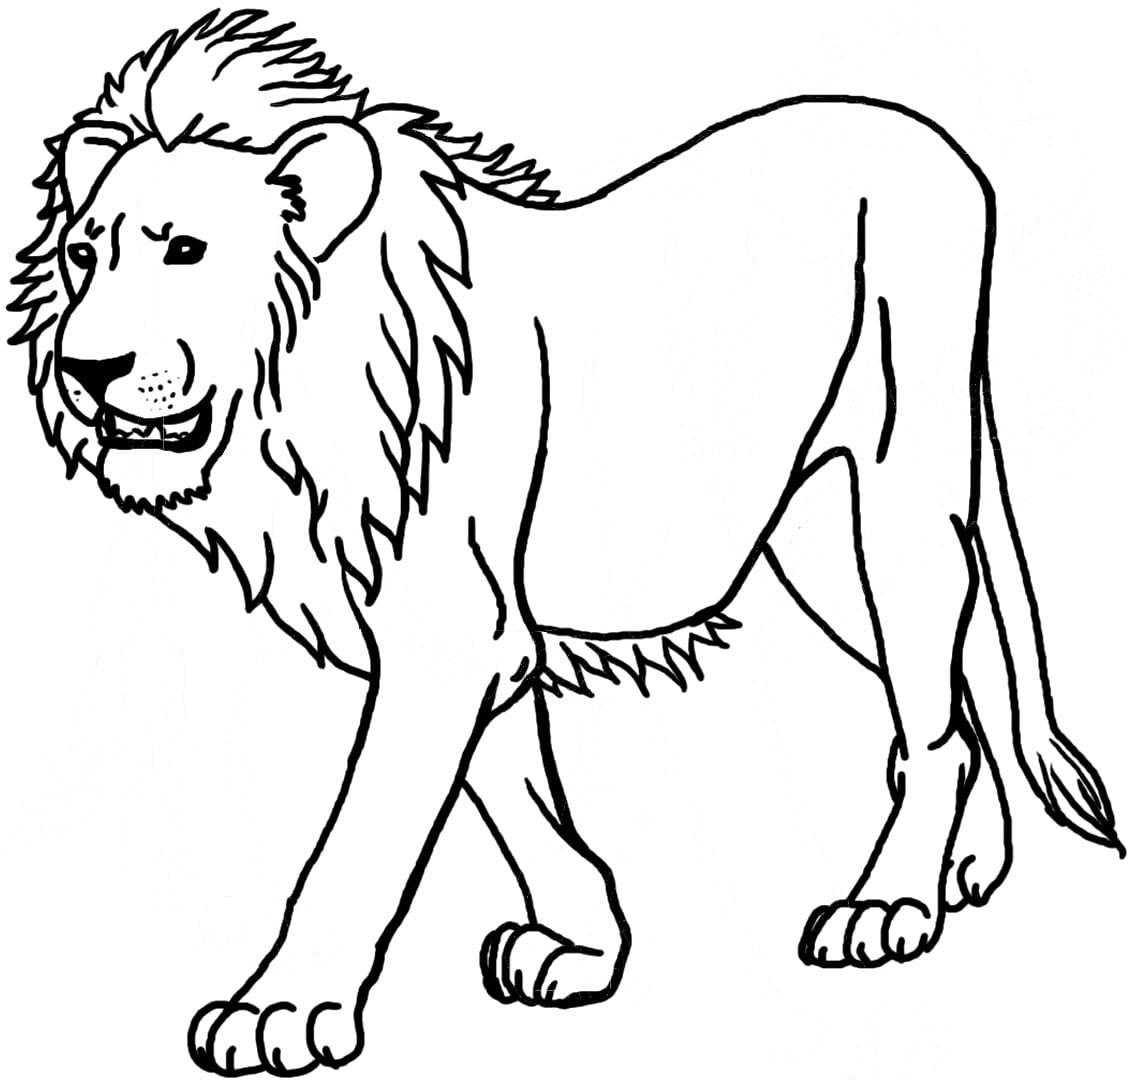 Impressive Coloring Picture Of A Lion 28  2093